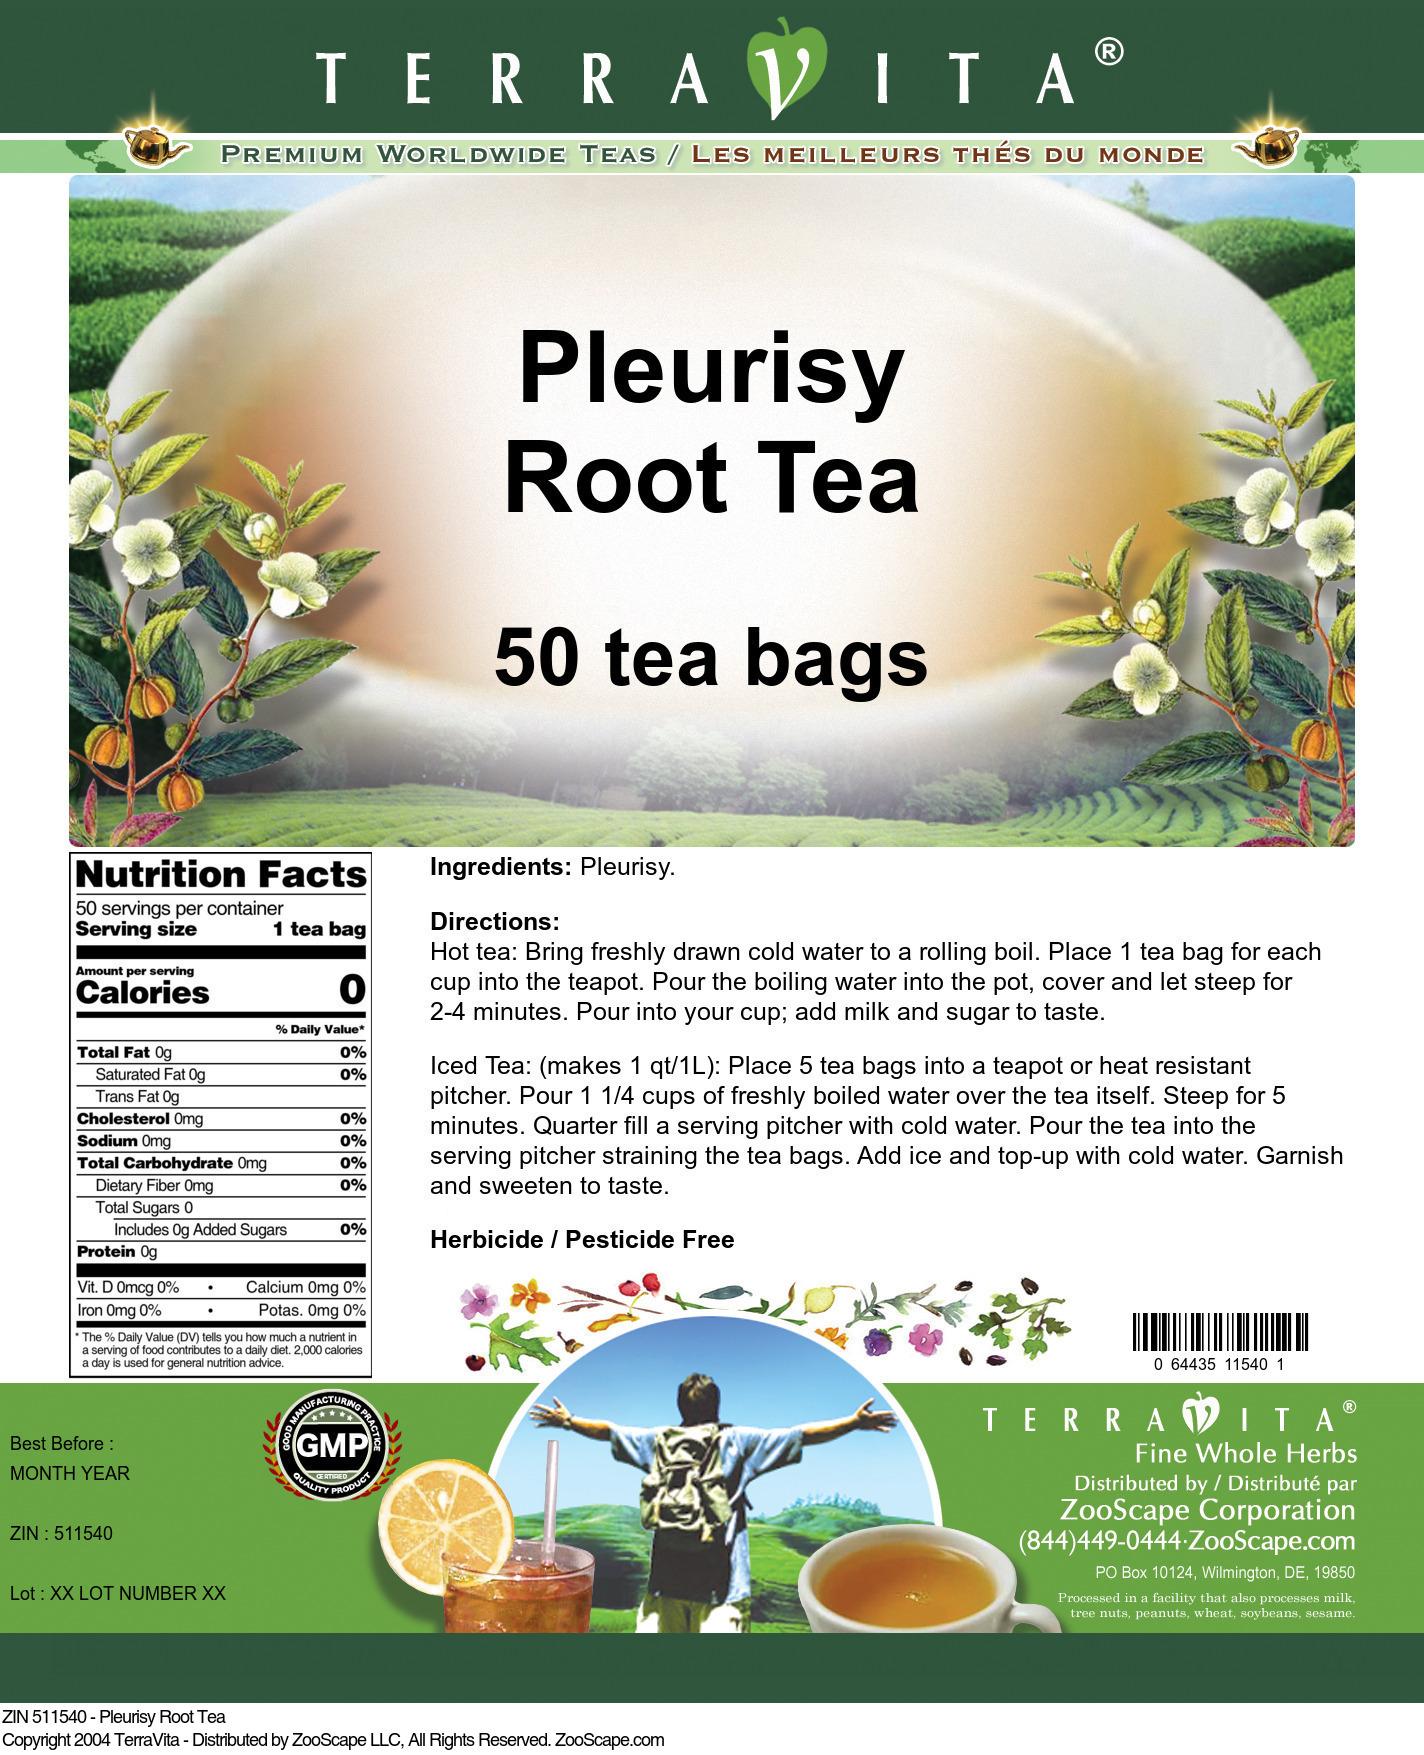 Pleurisy Root Tea